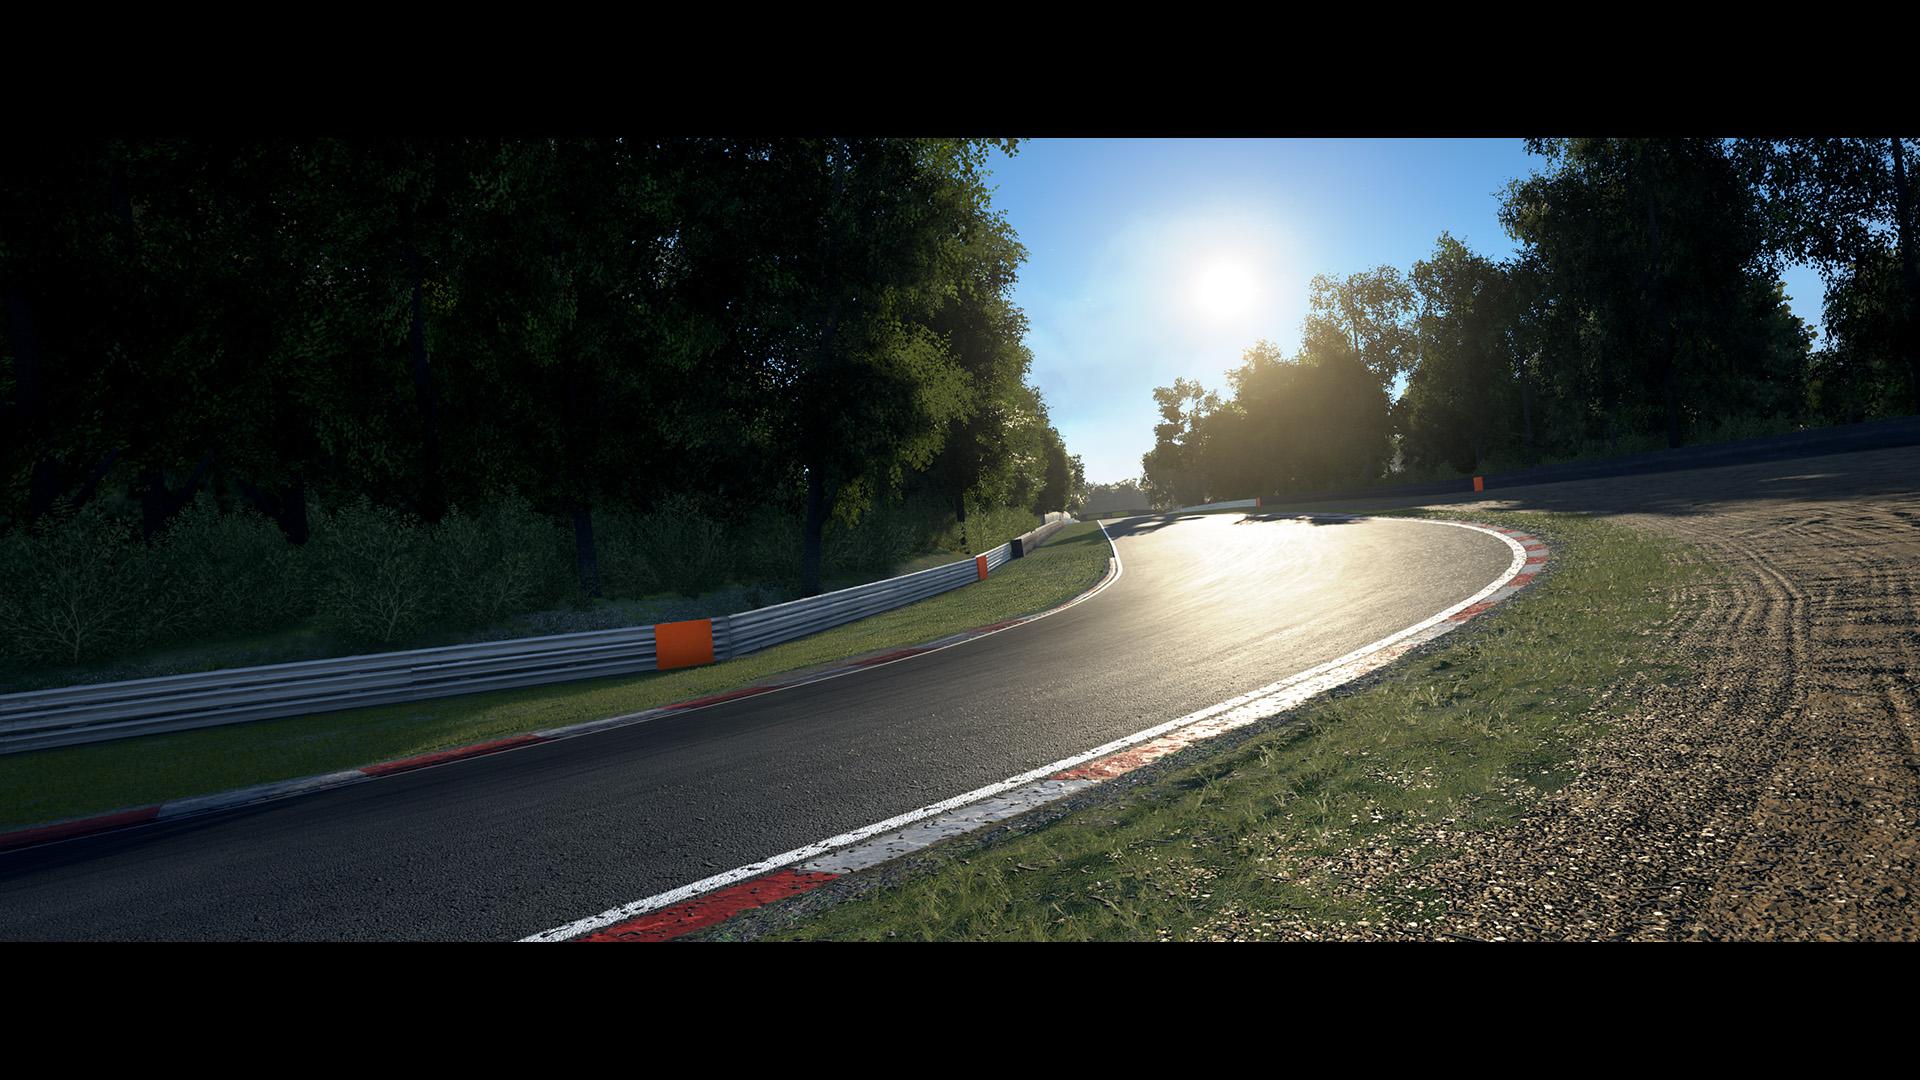 acc-racedepartment-com-4-jpg.239779